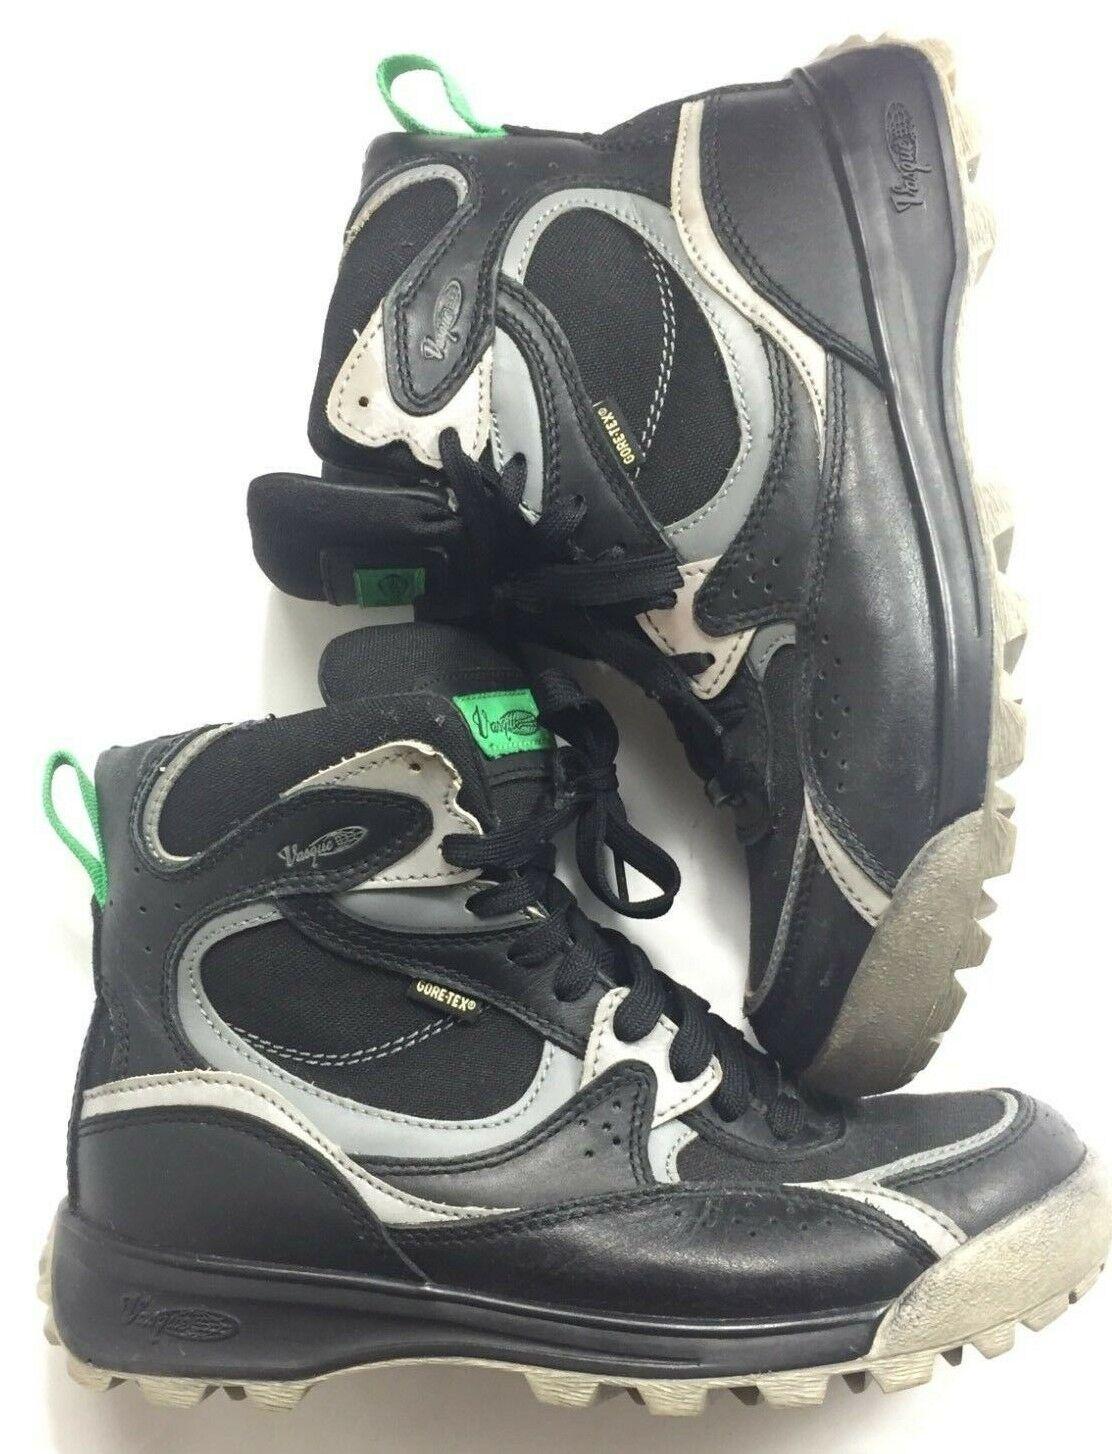 edizione limitata Vasque Skywalk GORE-TEX Hiking stivali Uomo Waterproof Winter Backpacking Backpacking Backpacking Trail  controlla il più economico